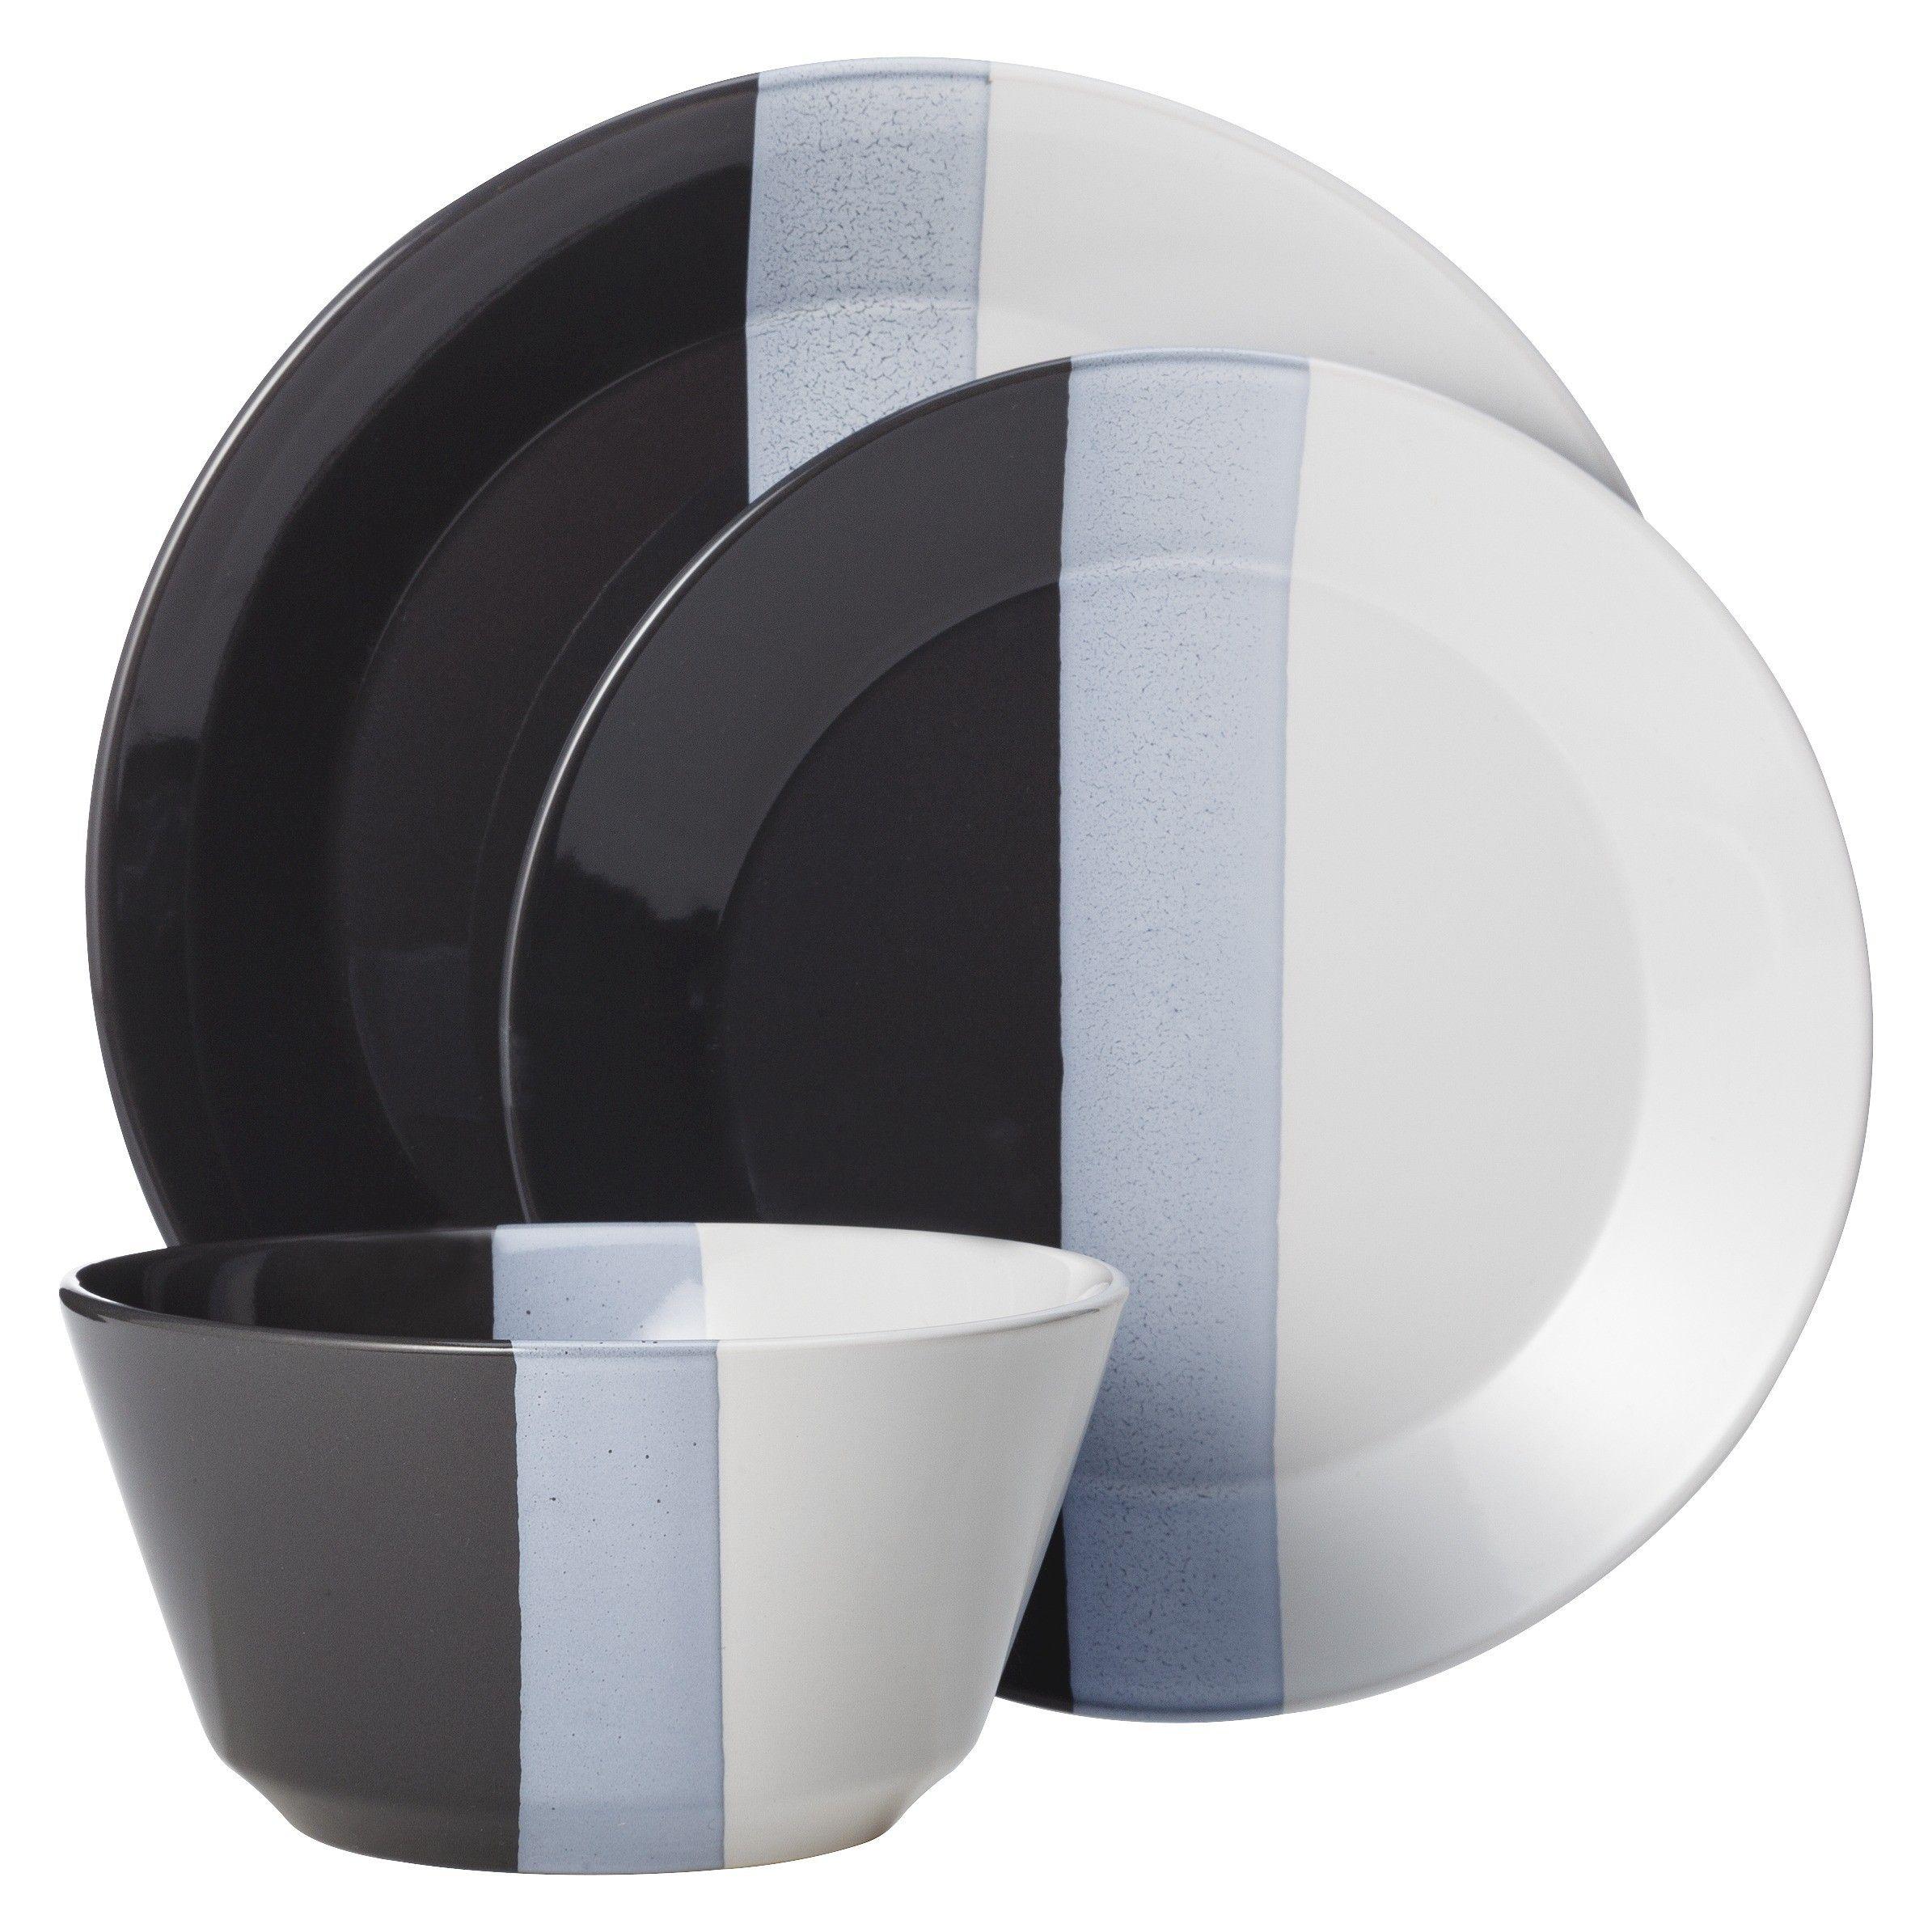 Room Essentials Tri Band 12 Piece Dinnerware Set Target With